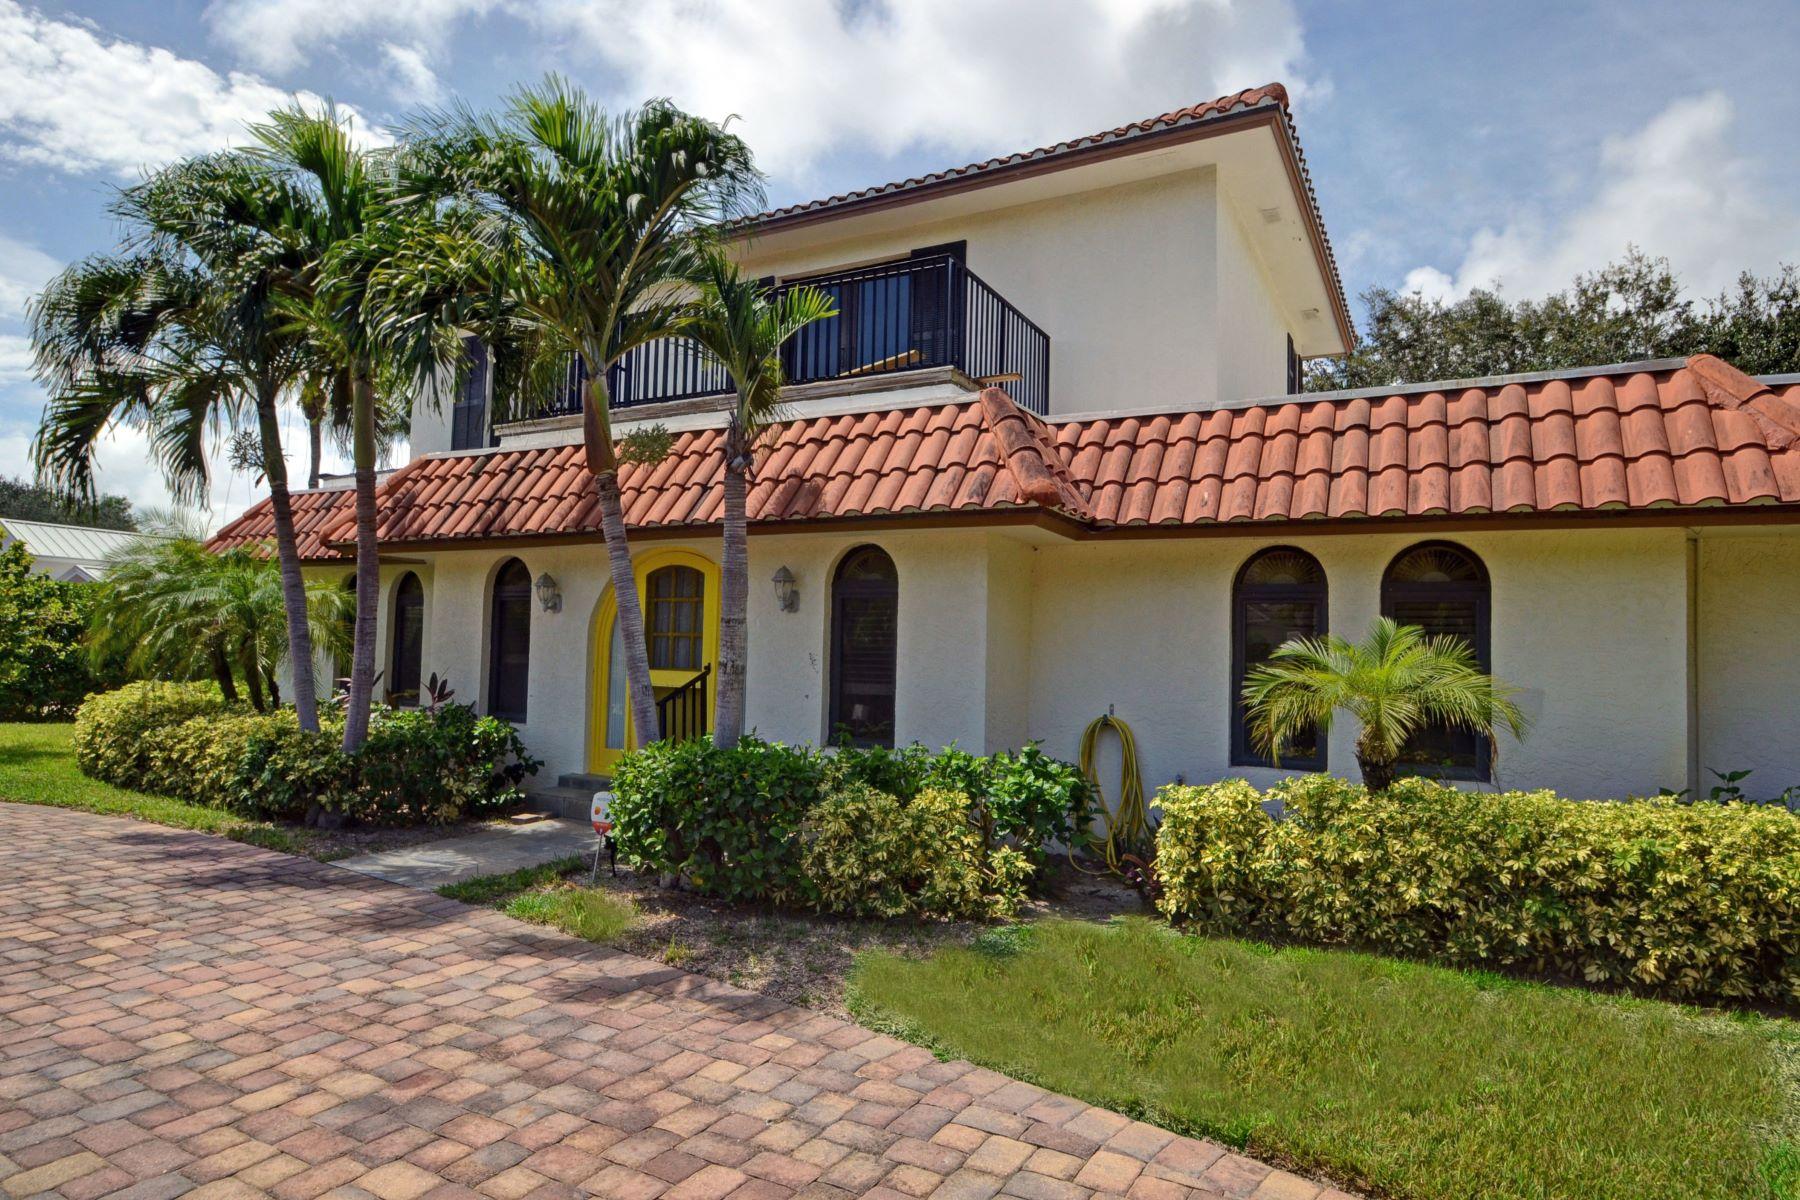 Casa Unifamiliar por un Venta en Marquis Old Riomar Estate Residence 1807 Ocean Drive Vero Beach, Florida, 32963 Estados Unidos